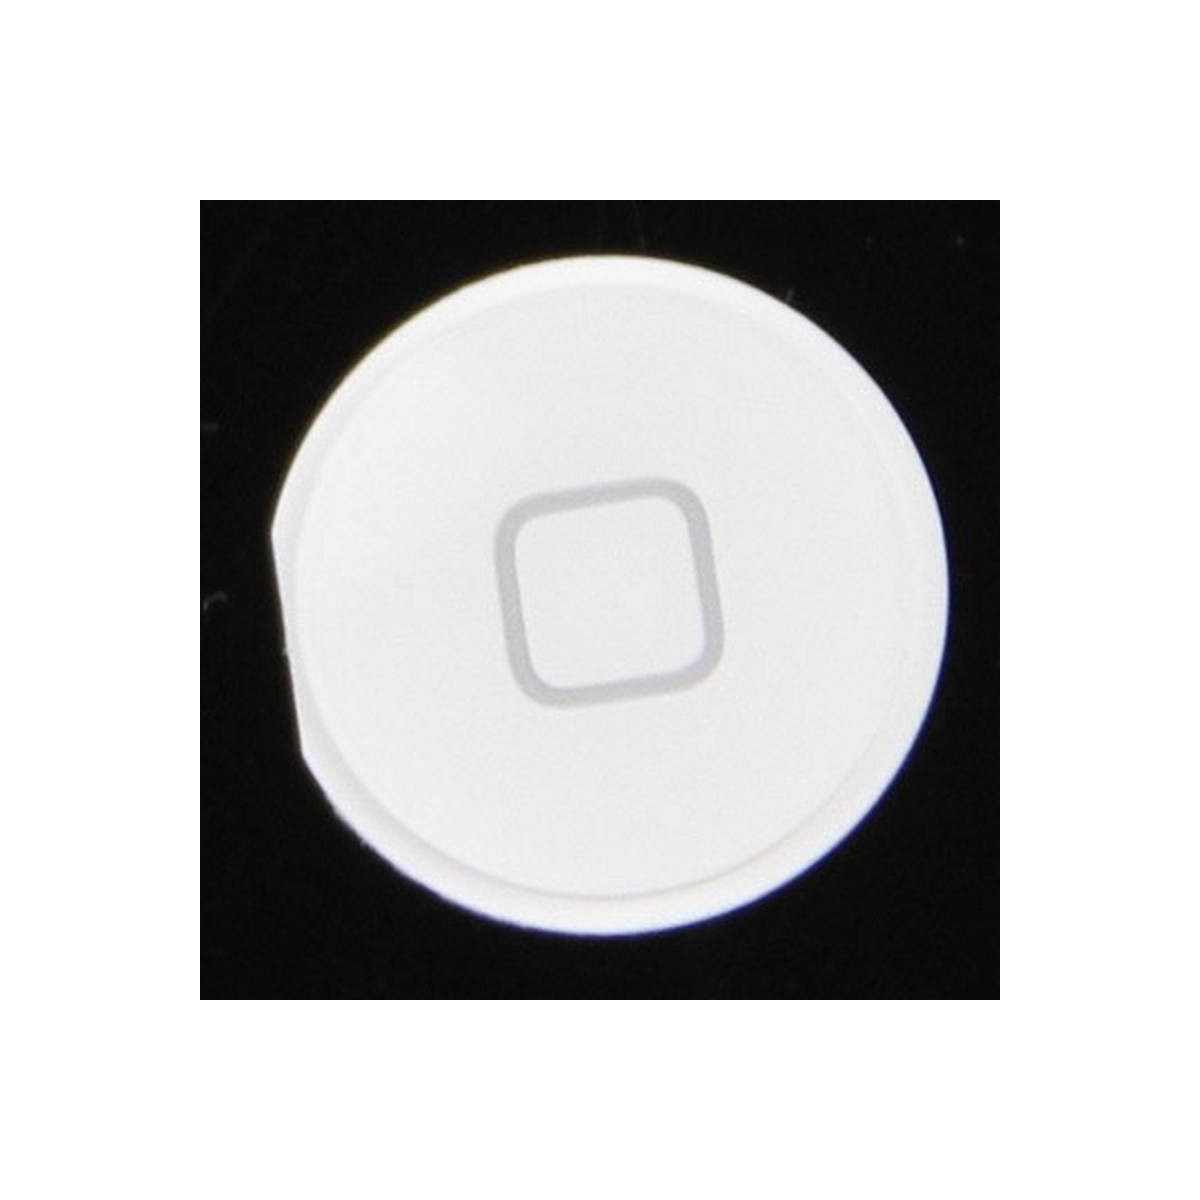 Boton Home Blanco ORIGINAL de iPad 2